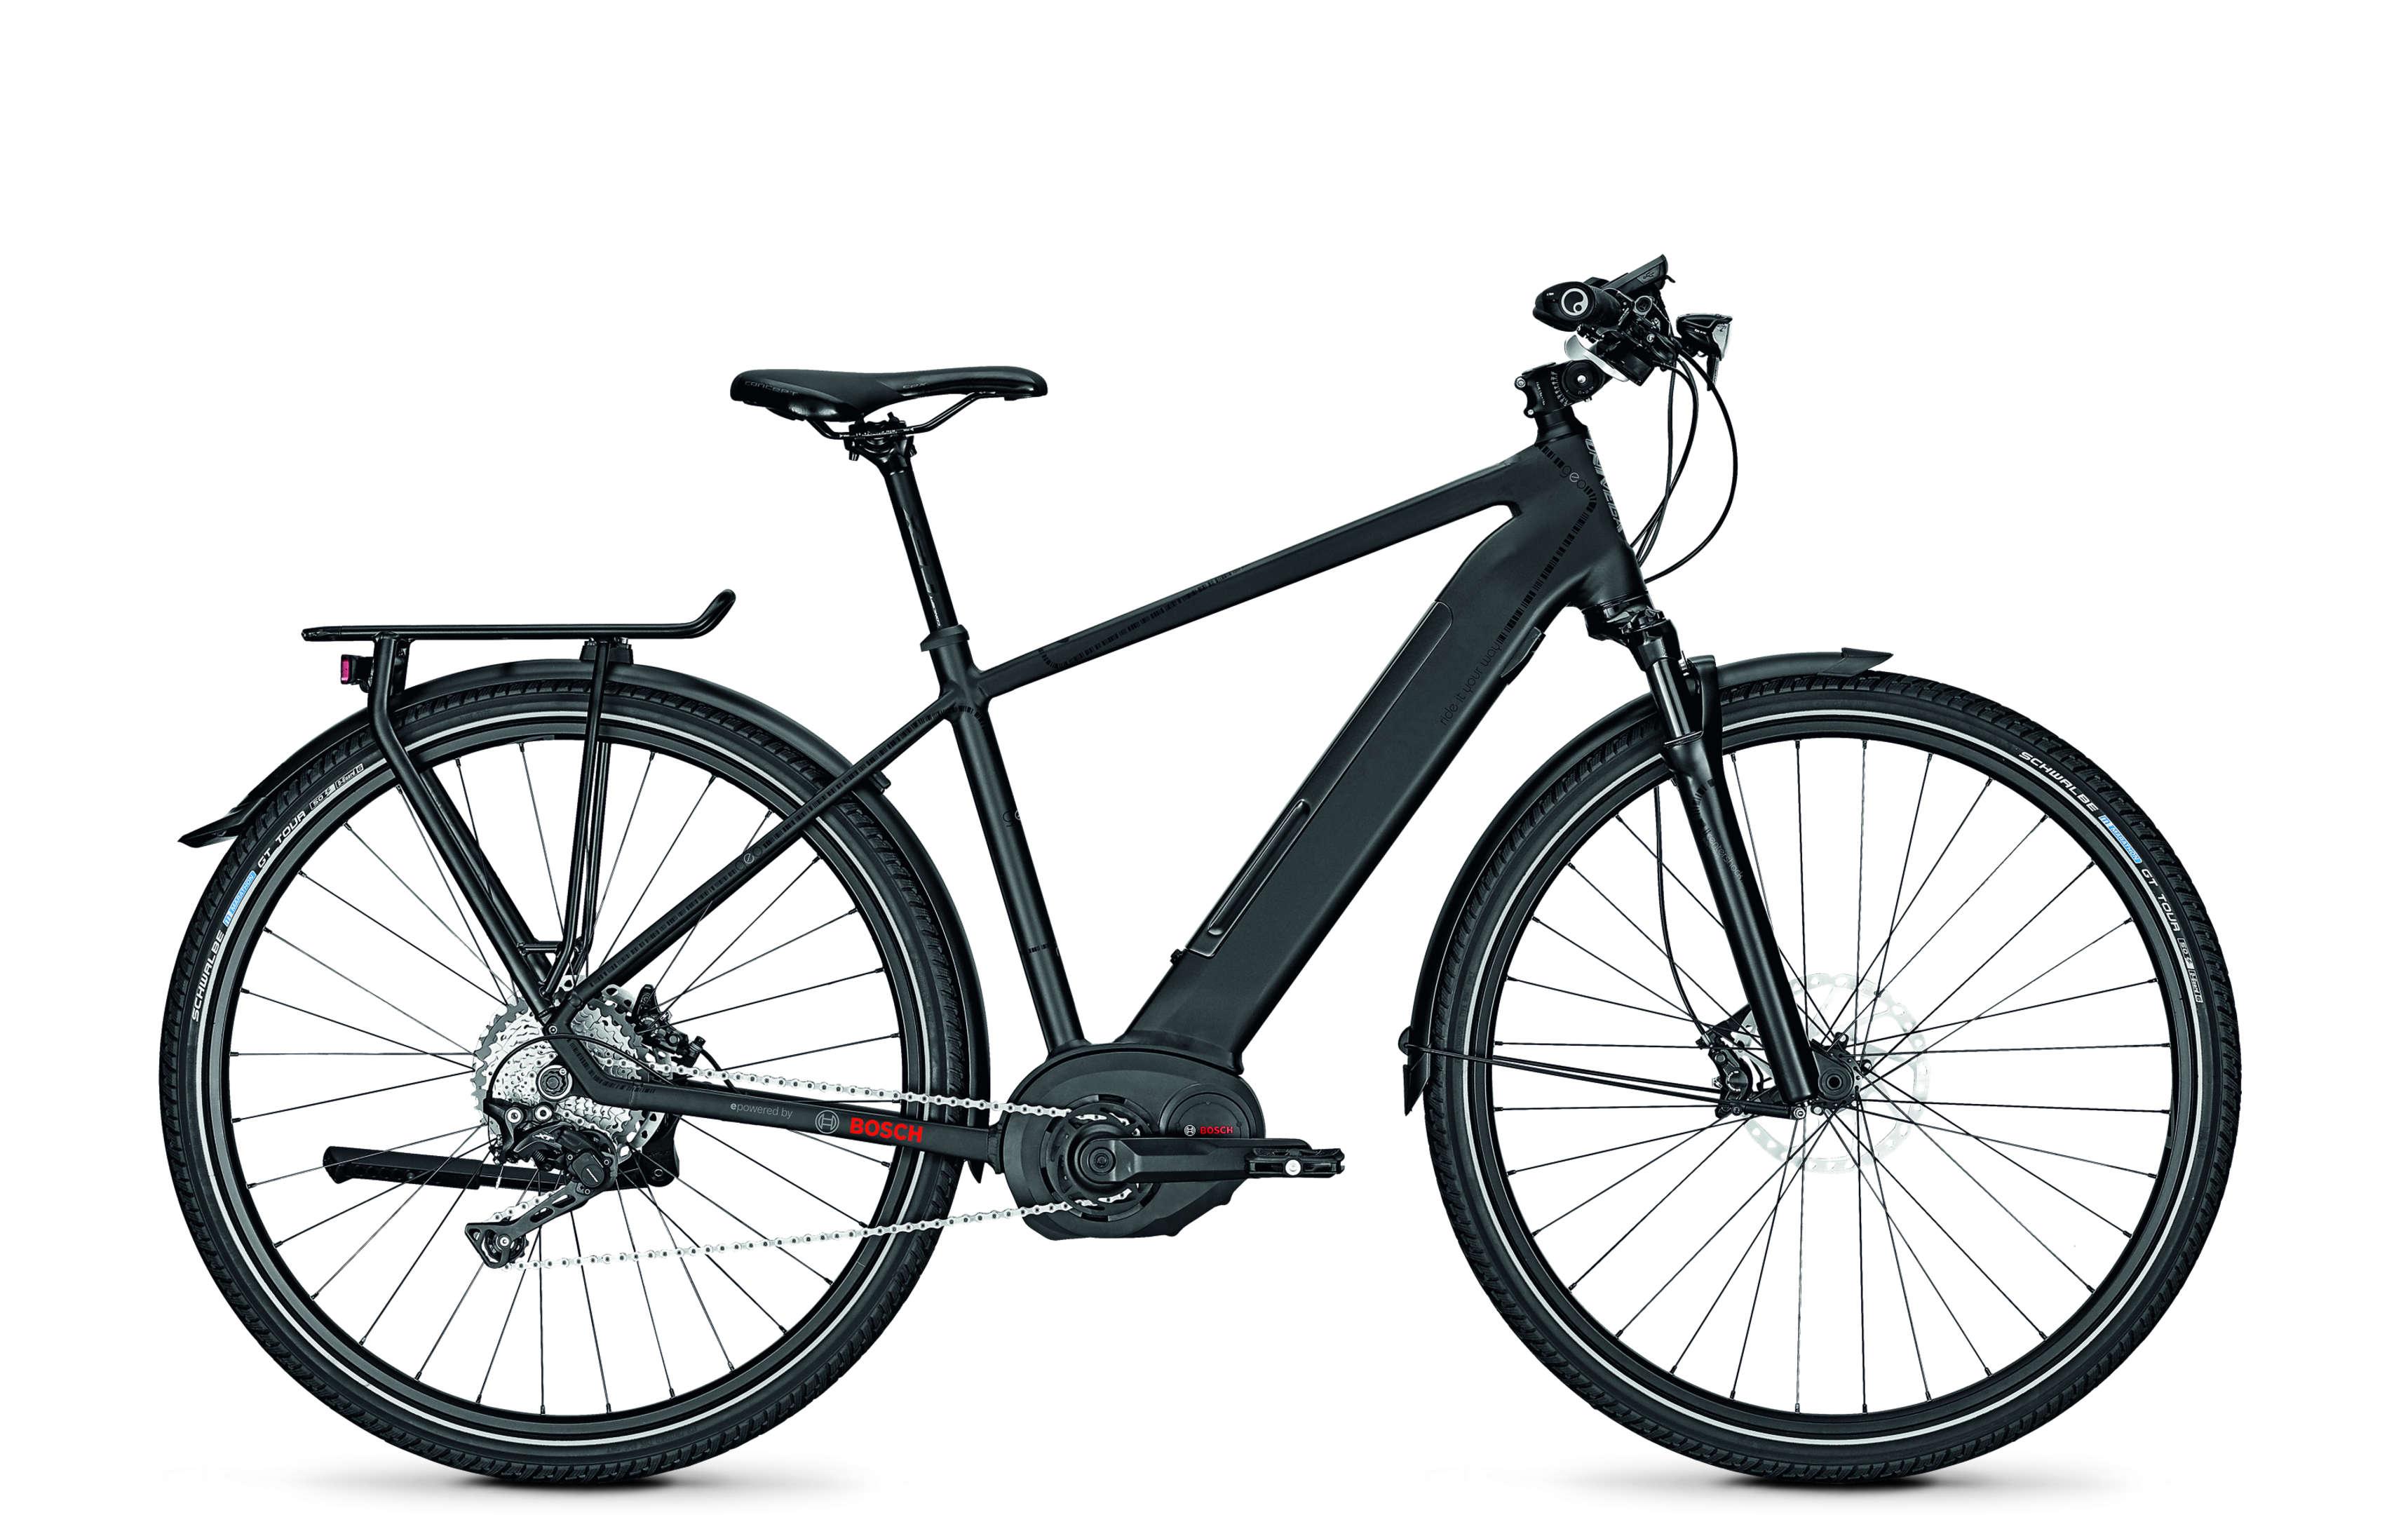 univega e bike geo i e 5 0 10g 13 4ah 36v eurorad bikeleasingeurorad bikeleasing. Black Bedroom Furniture Sets. Home Design Ideas